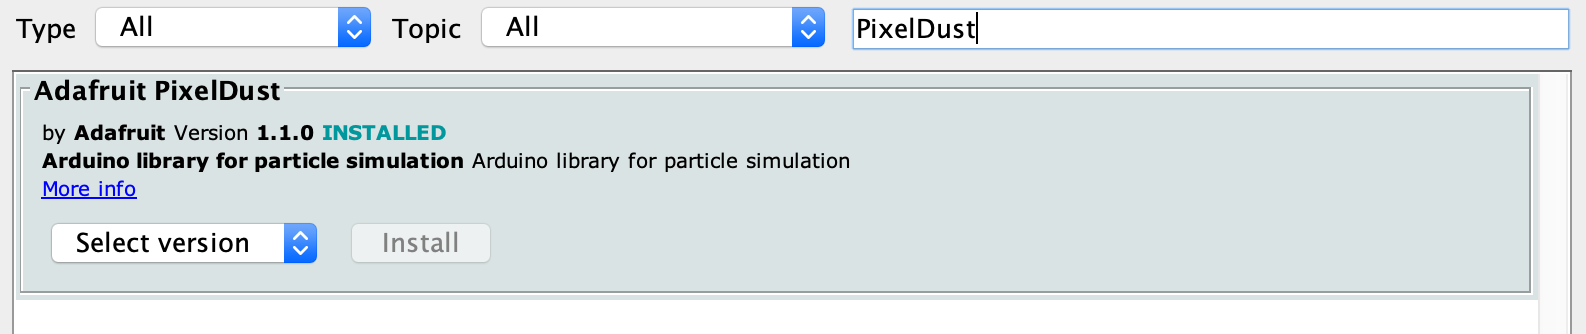 led_matrices_pixeldust.png